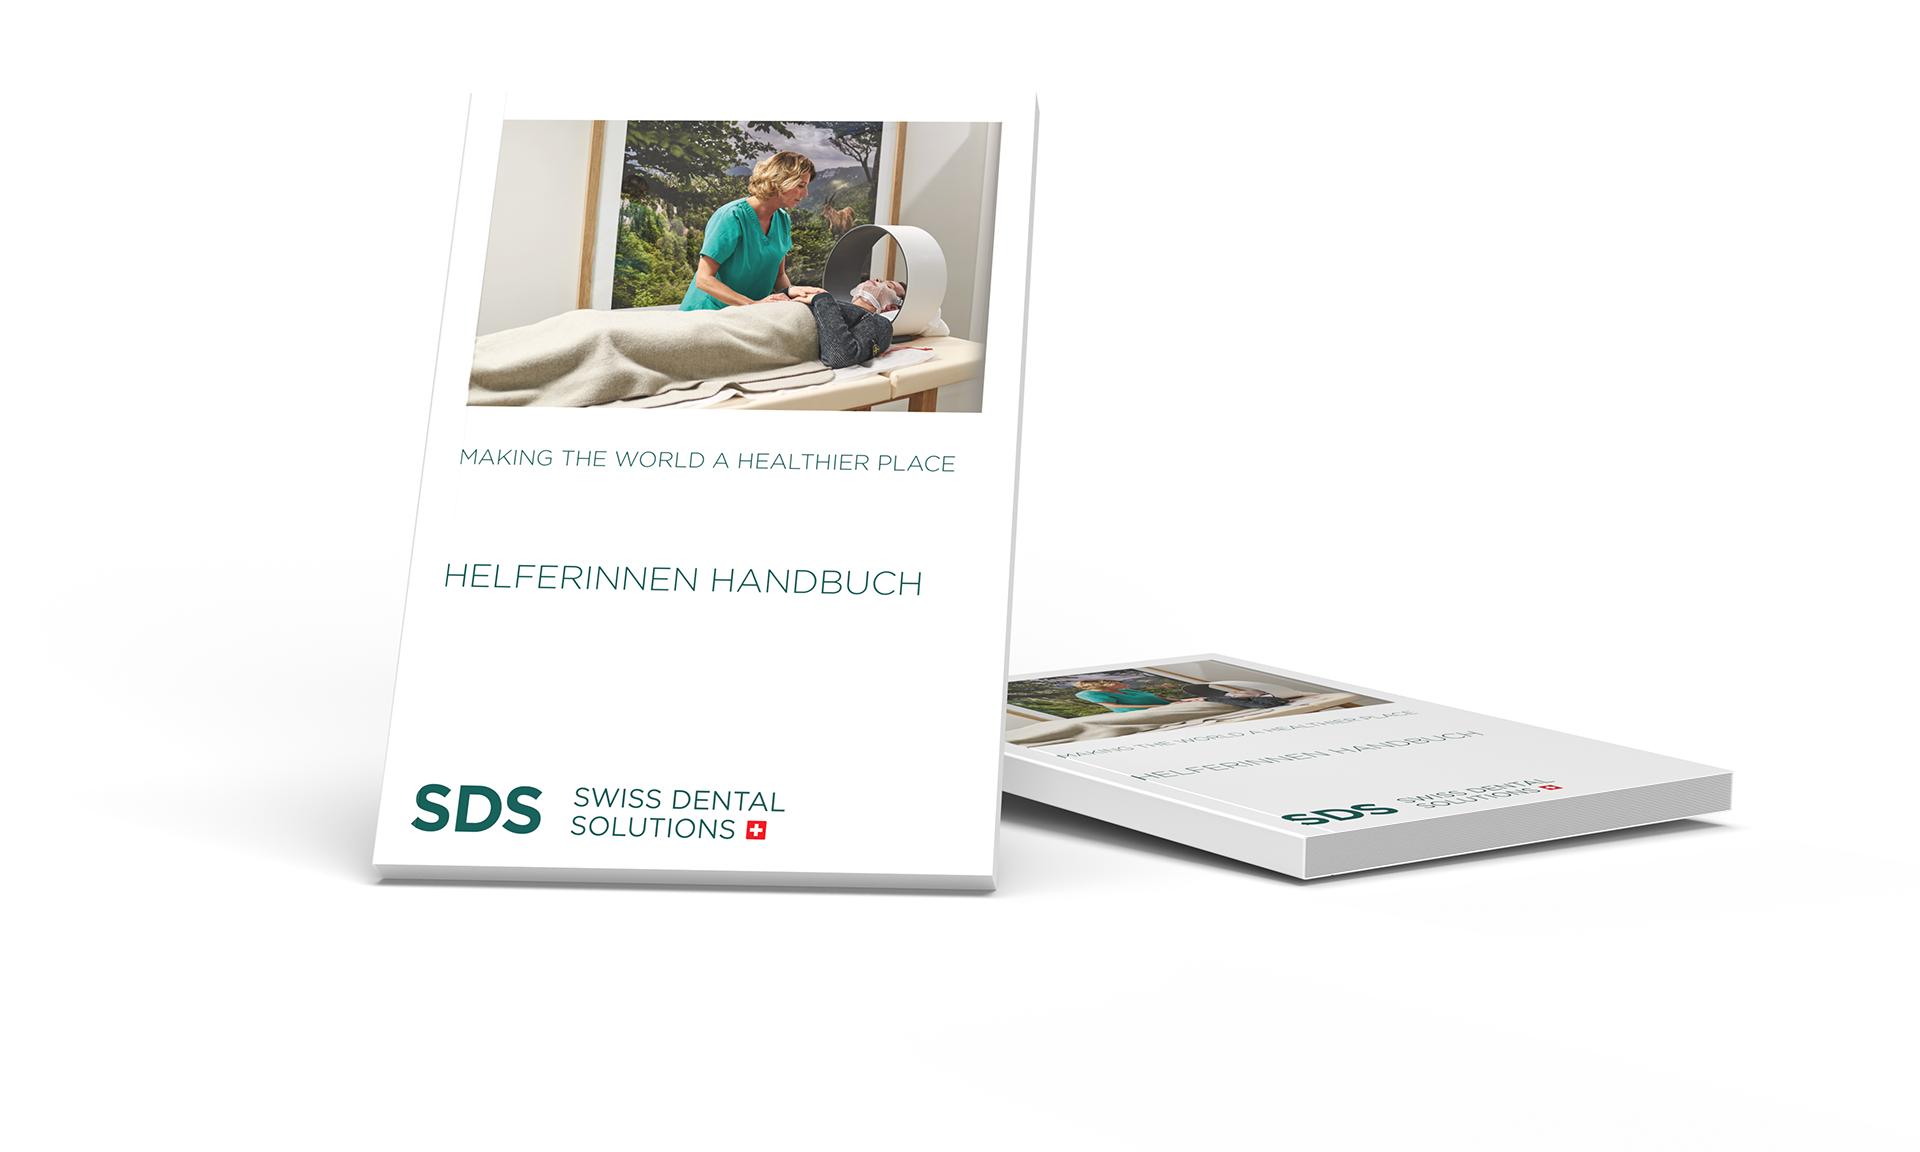 Helferinnen Handbuch Mockup